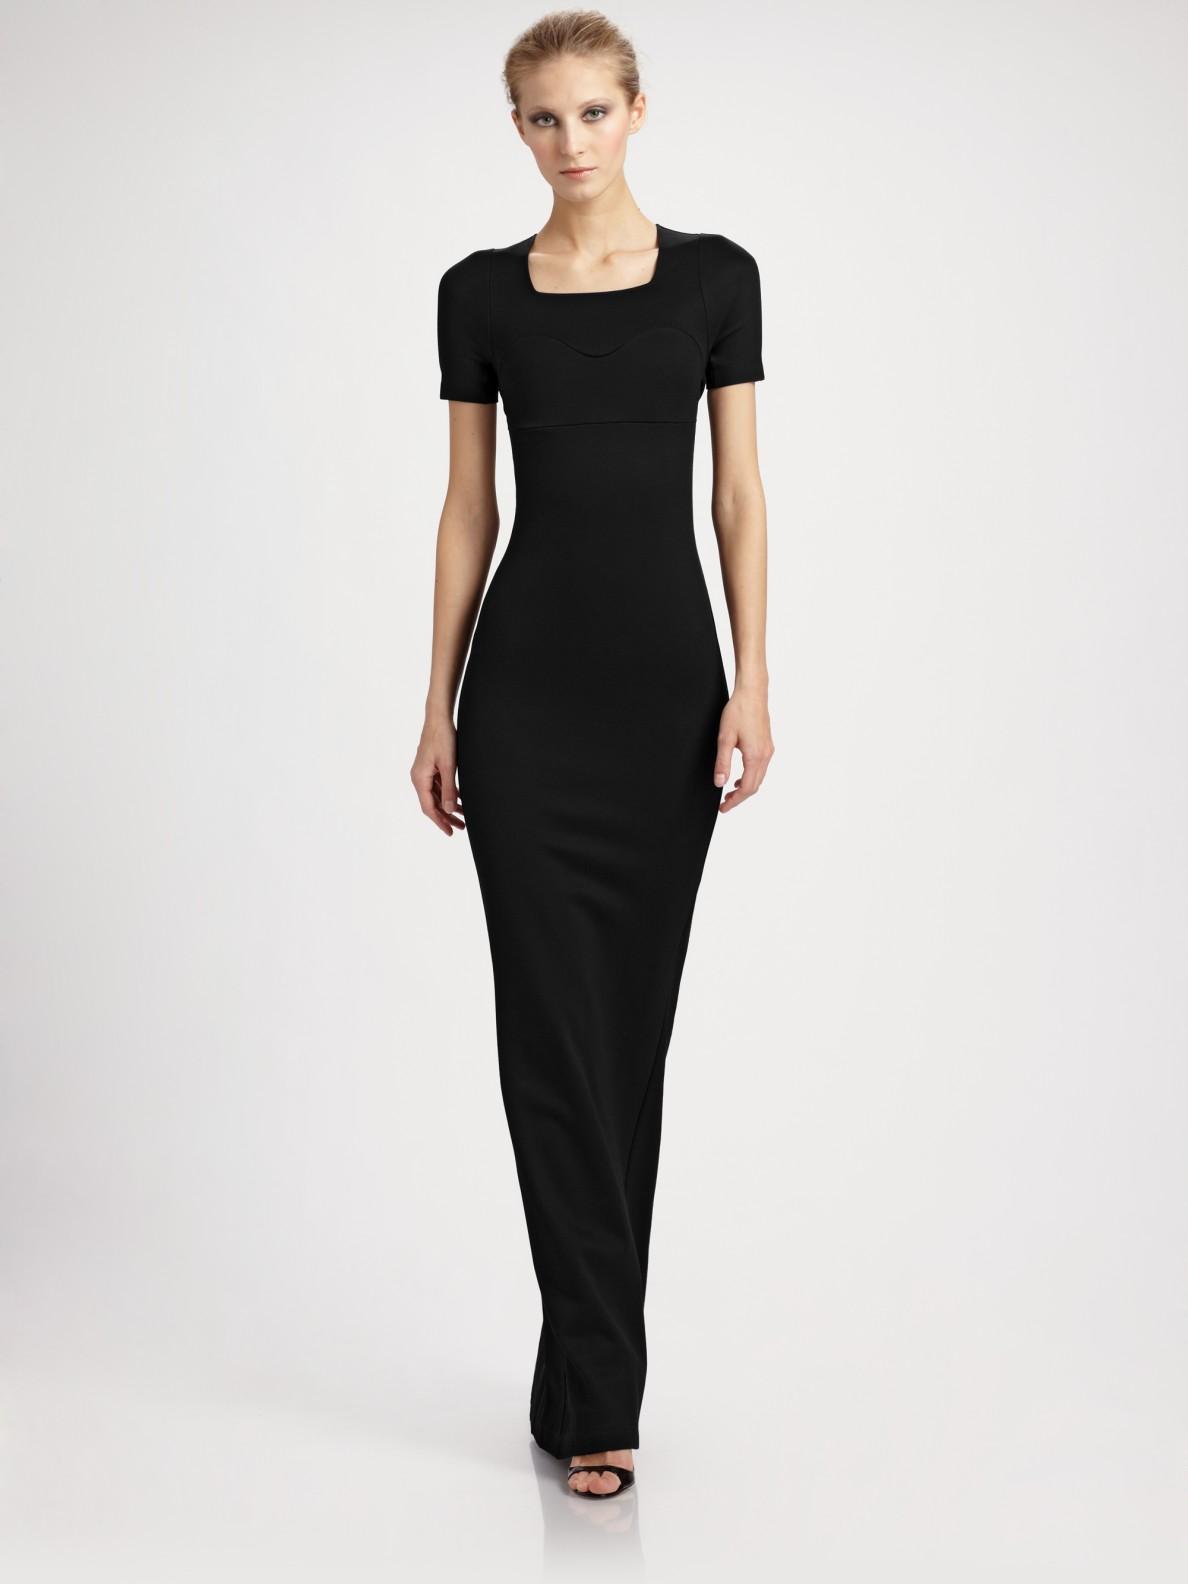 long black jersey dress